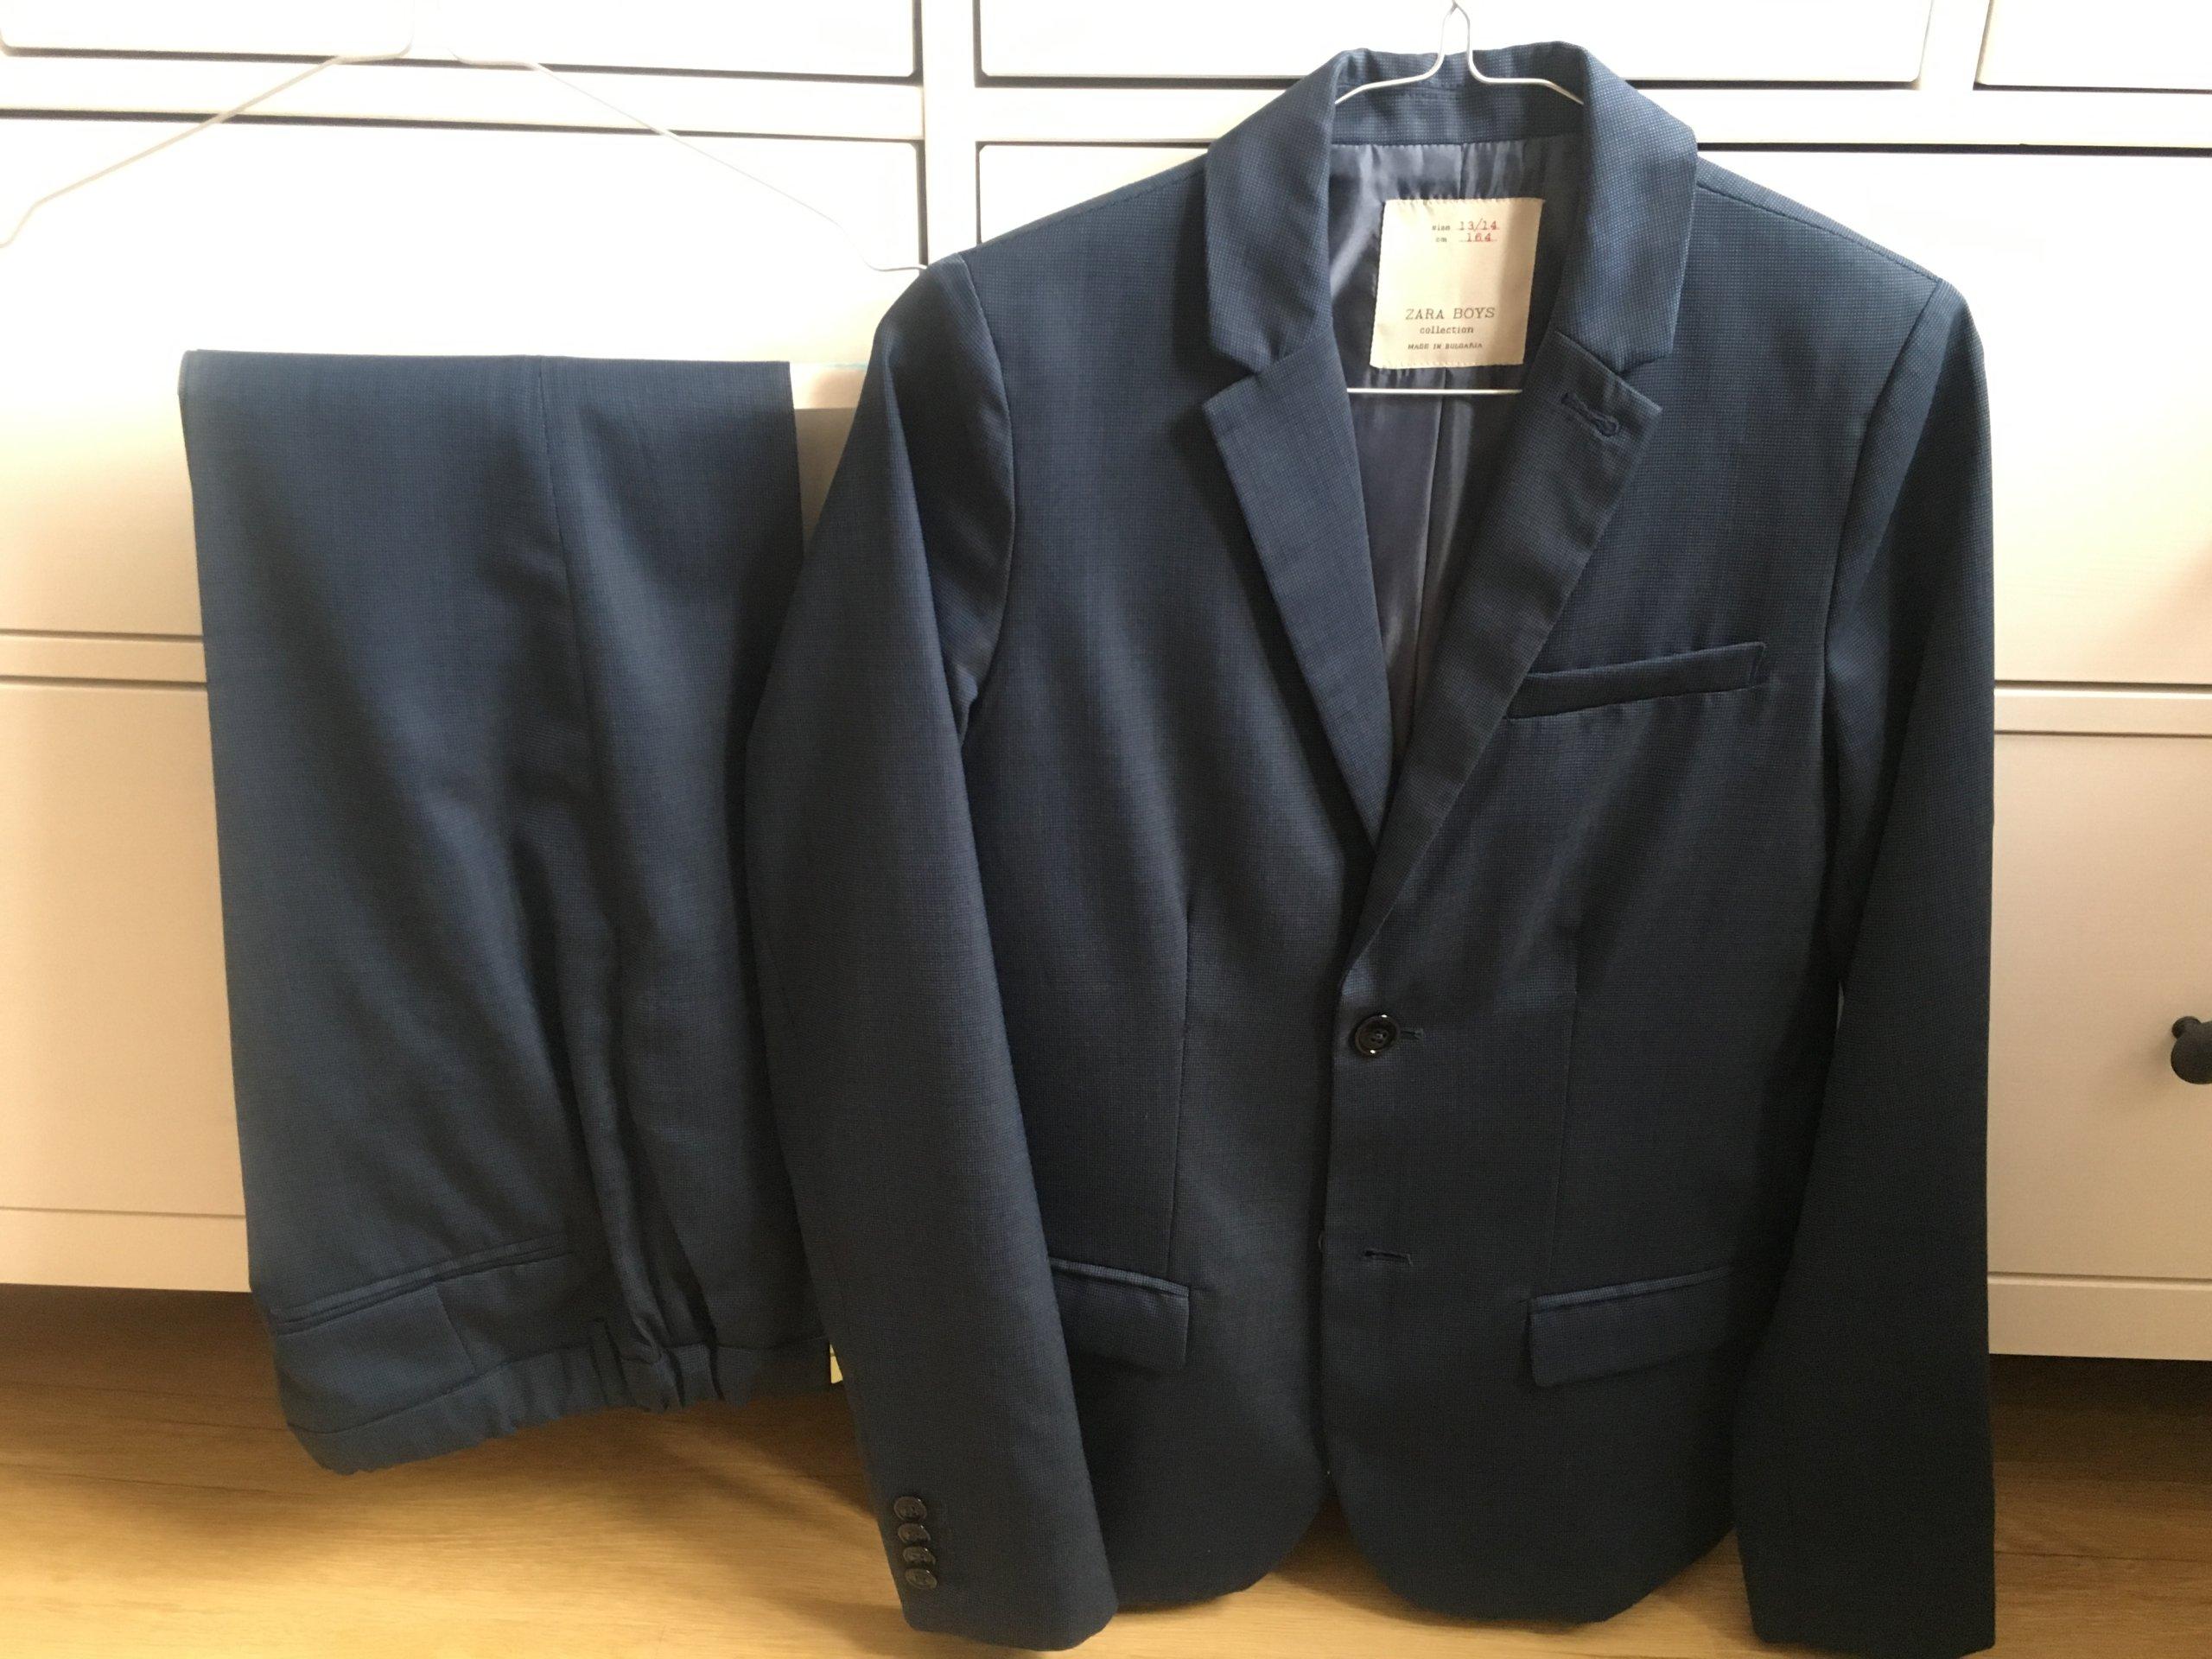 b4e63a6ce2712 Zara - garnitur 122 Jak Nowy! - 7232898948 - oficjalne archiwum allegro